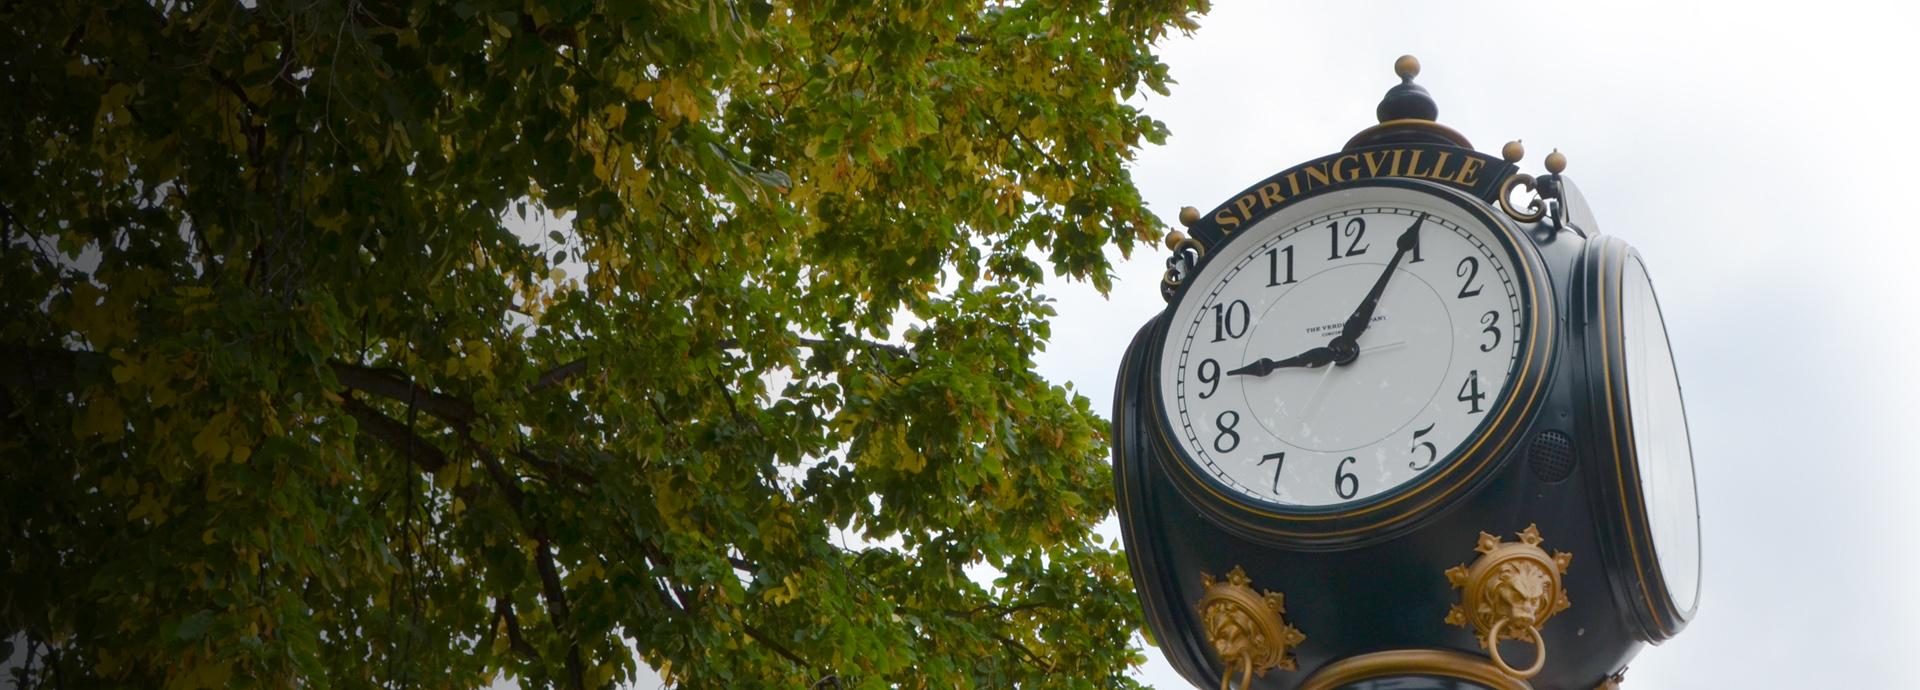 HBP precision machining | Springville, New York clock tower